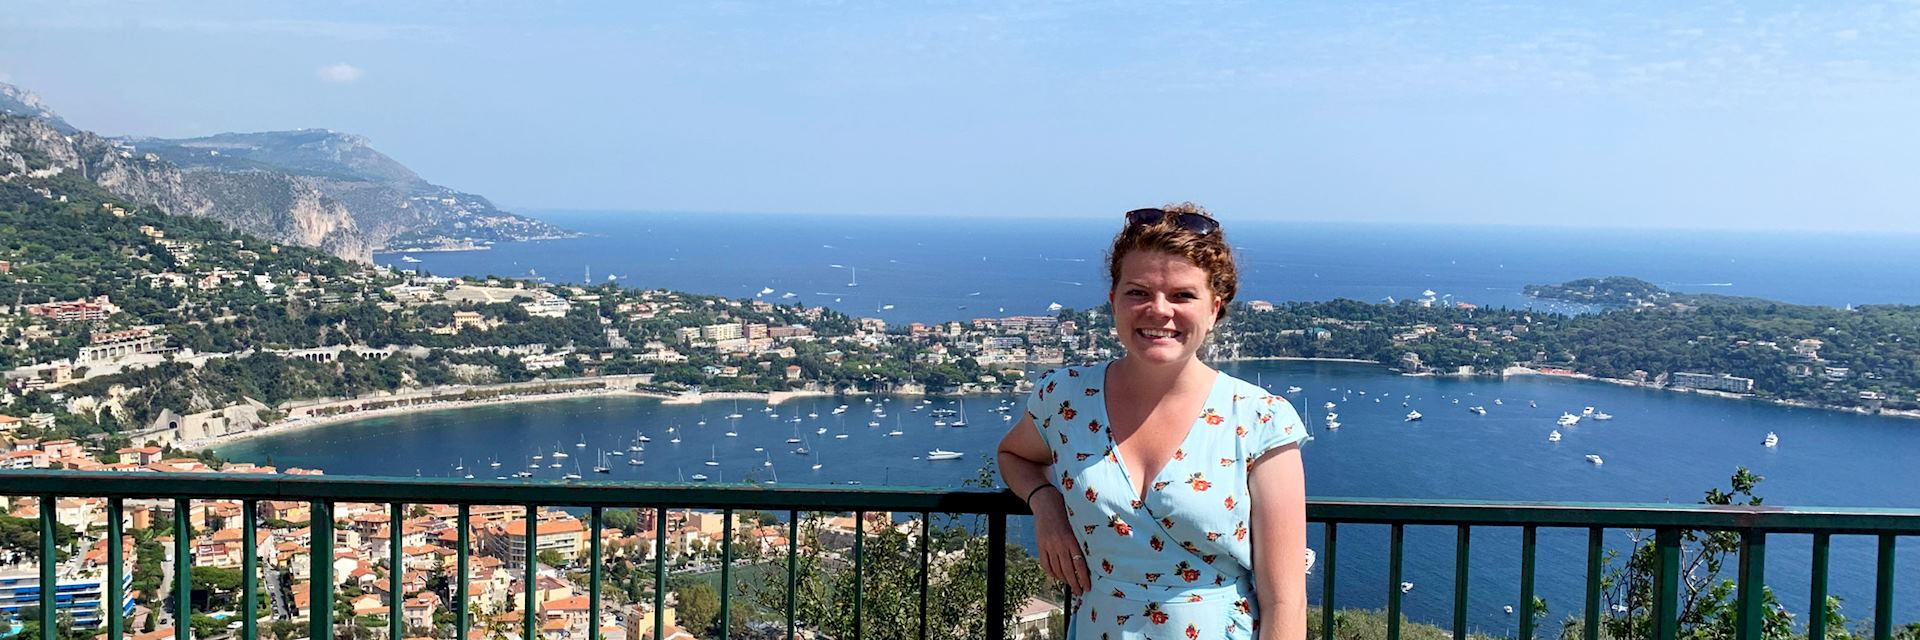 Jackie in Monaco